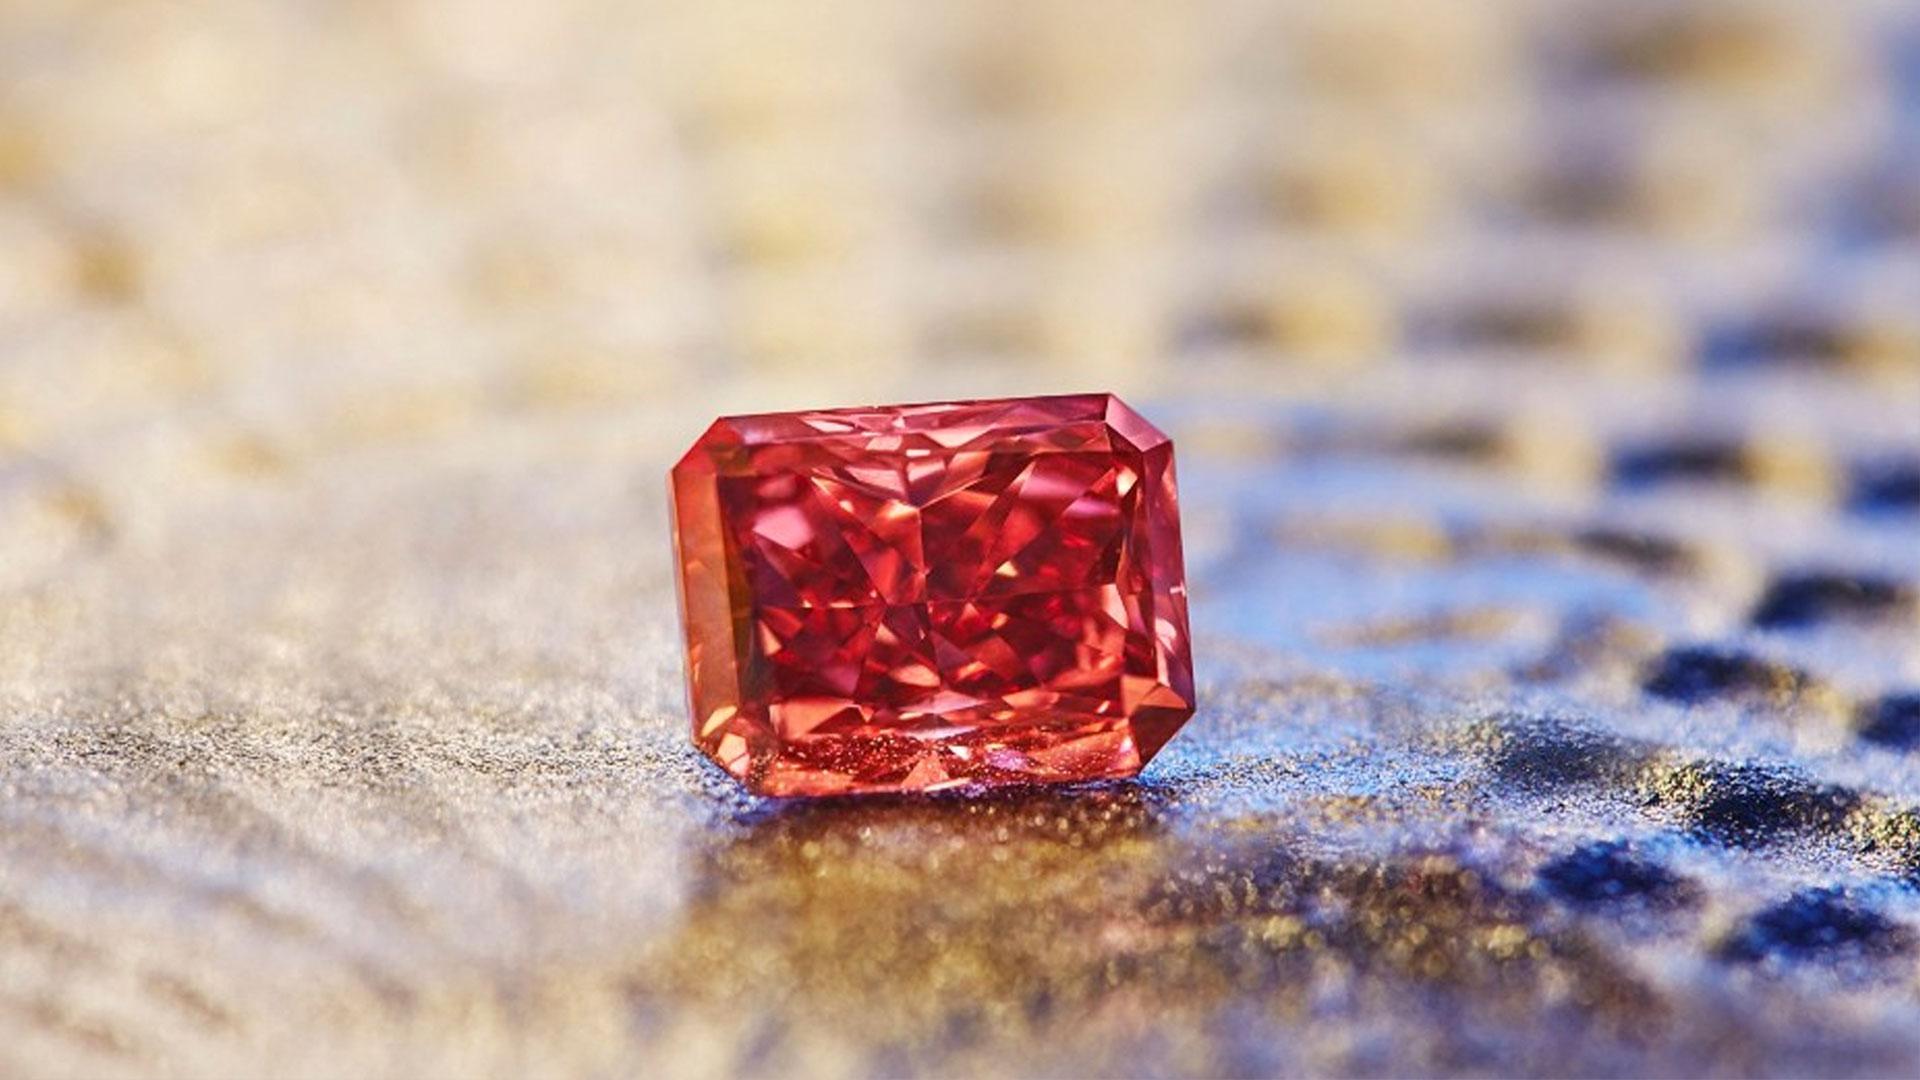 The Argyle Everglow 2.11ct Fancy Red Diamond